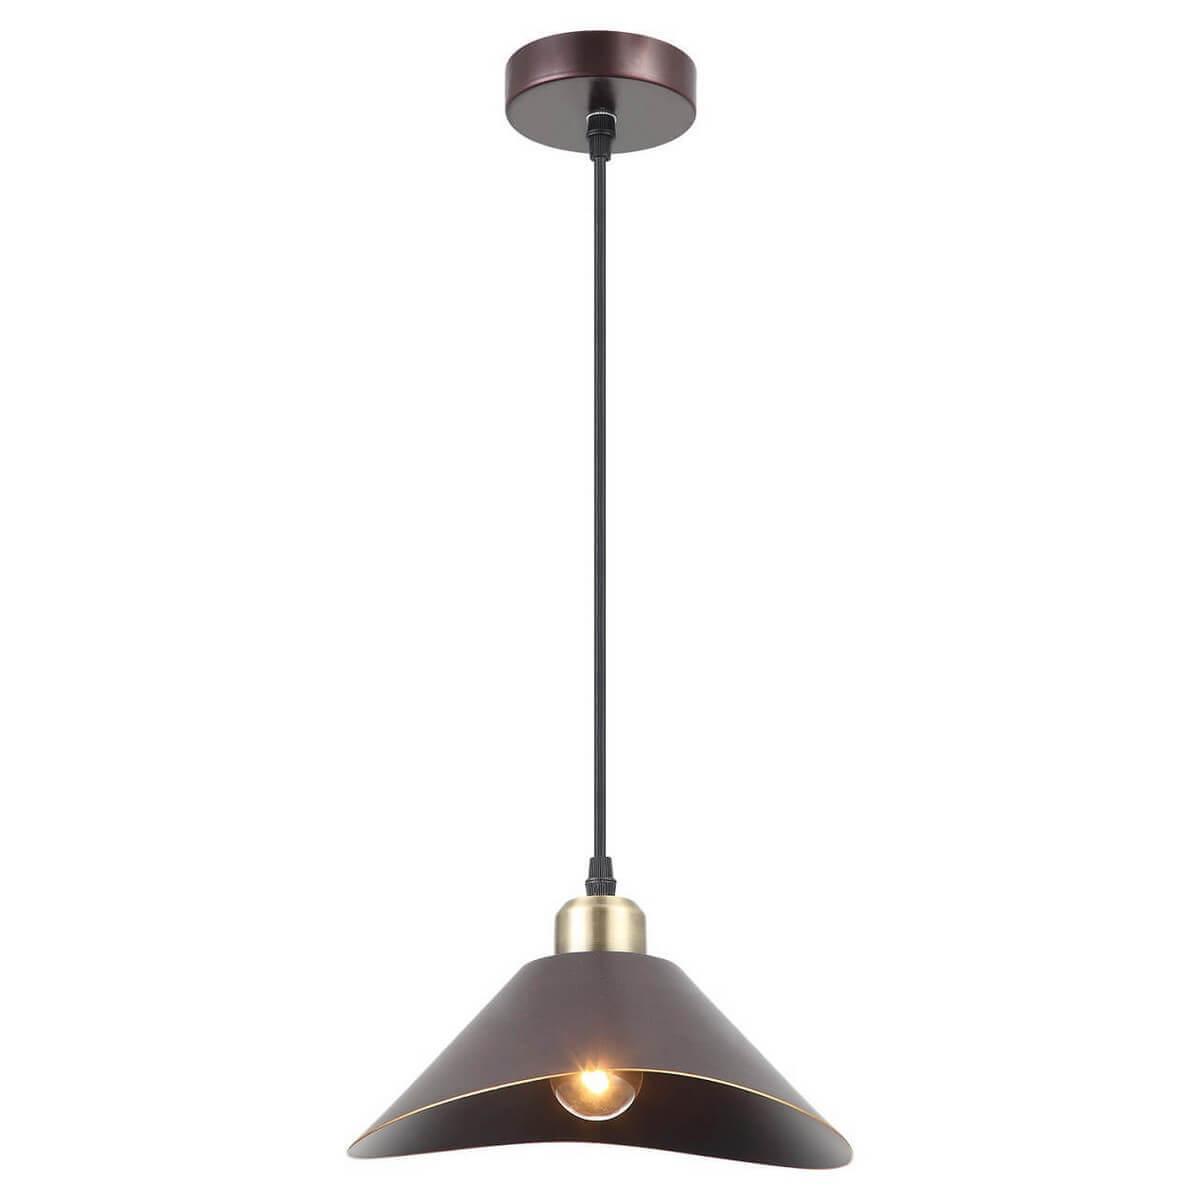 Светильник Lussole LOFT GRLSP-9533 Opelika недорого